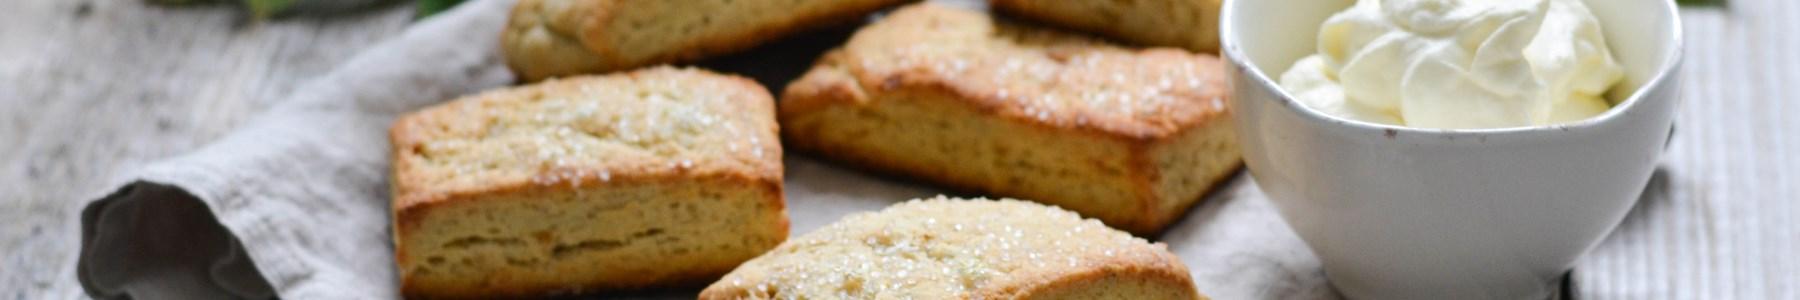 Småkager + Sødt brød